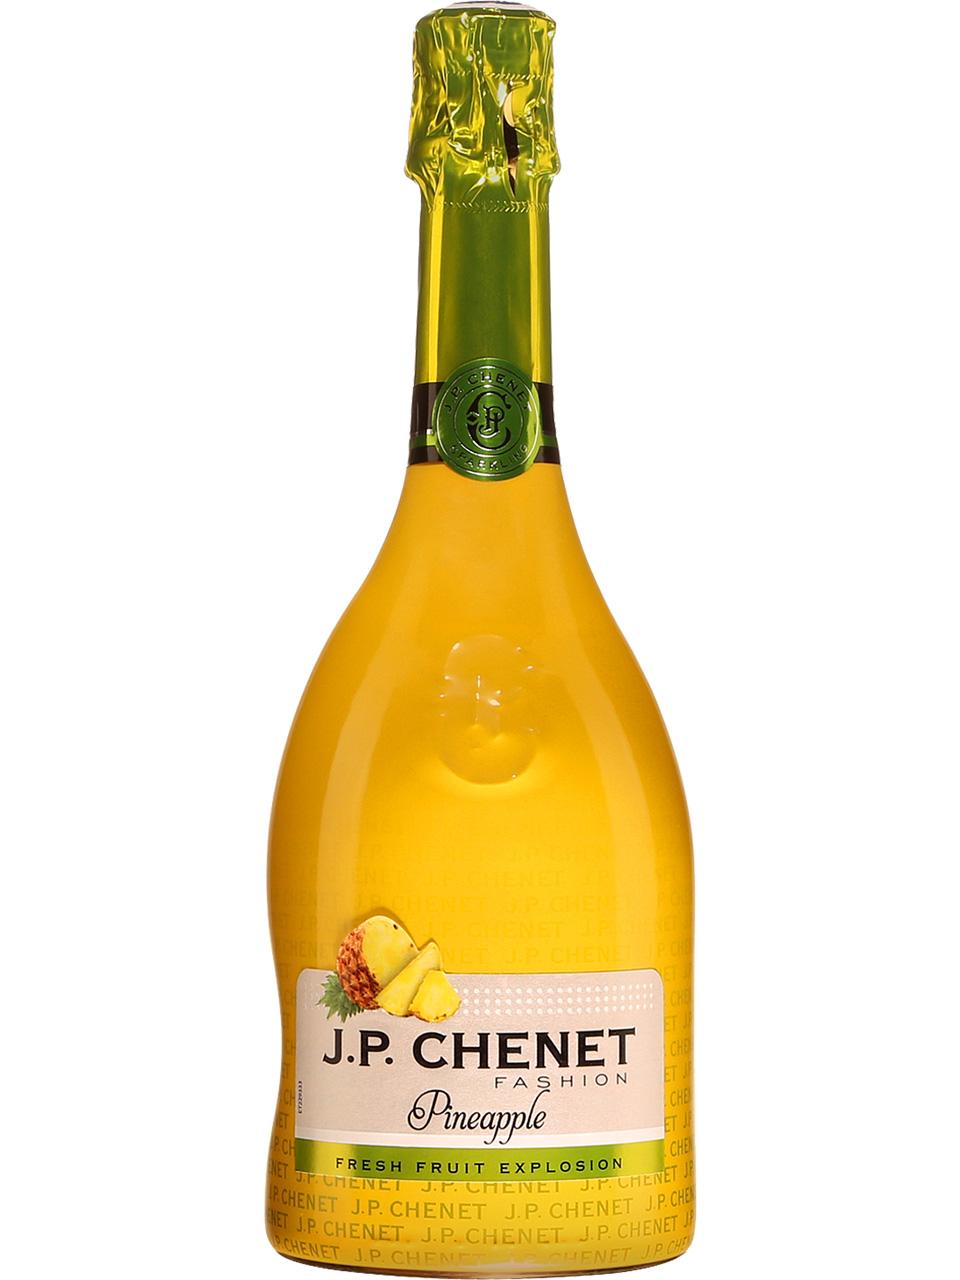 J.P. Chenet Fashion Pineapple Sparkling